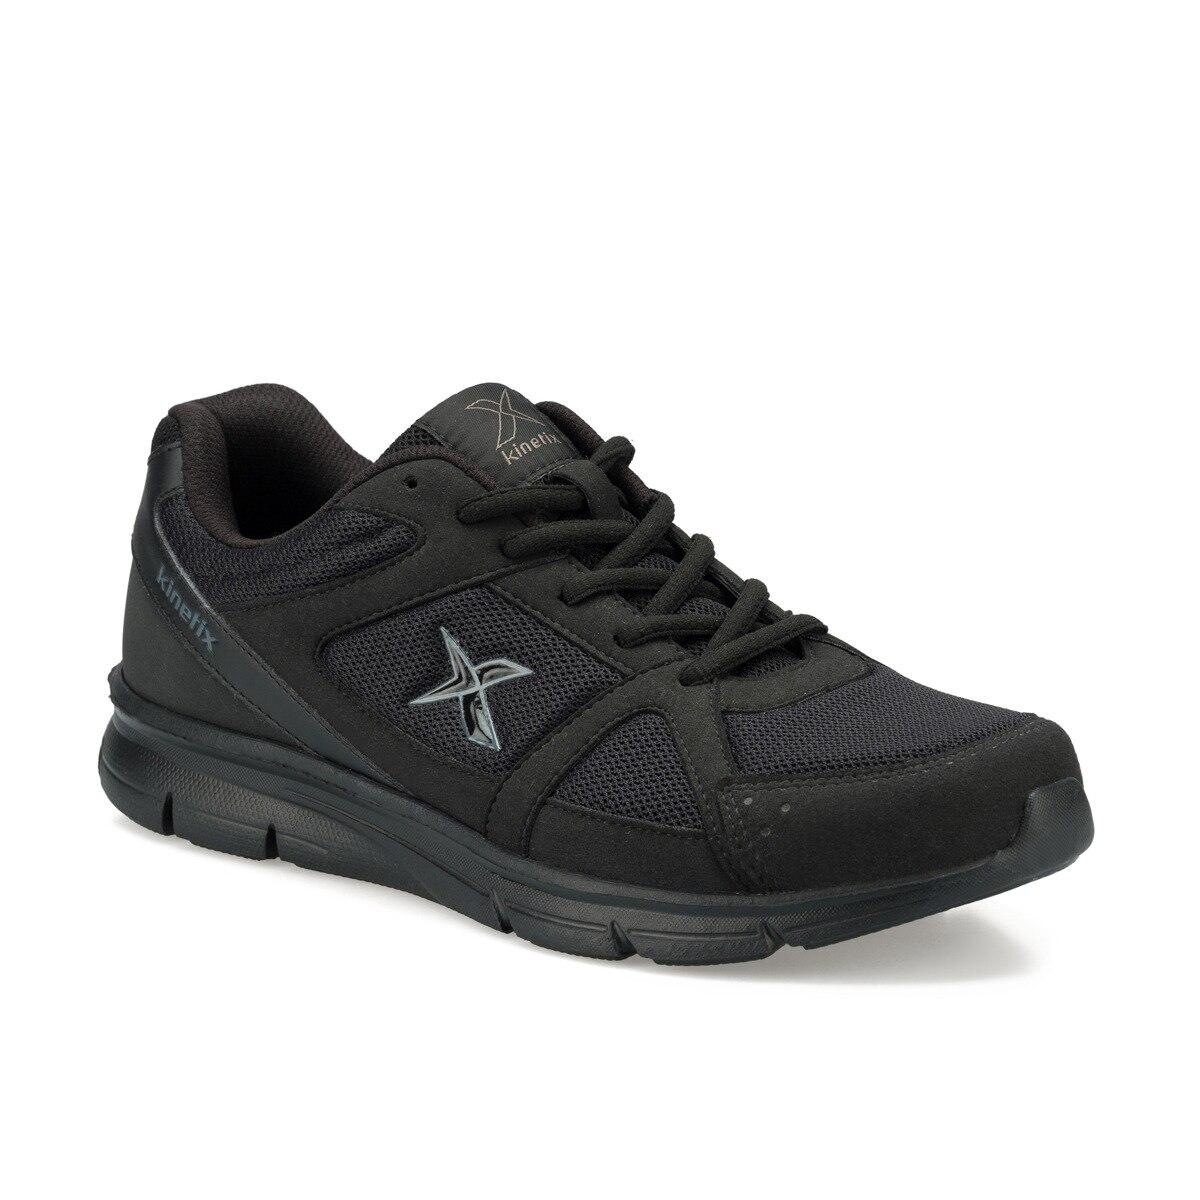 FLO KALEN TX Black Men 'S Running Shoe KINETIX